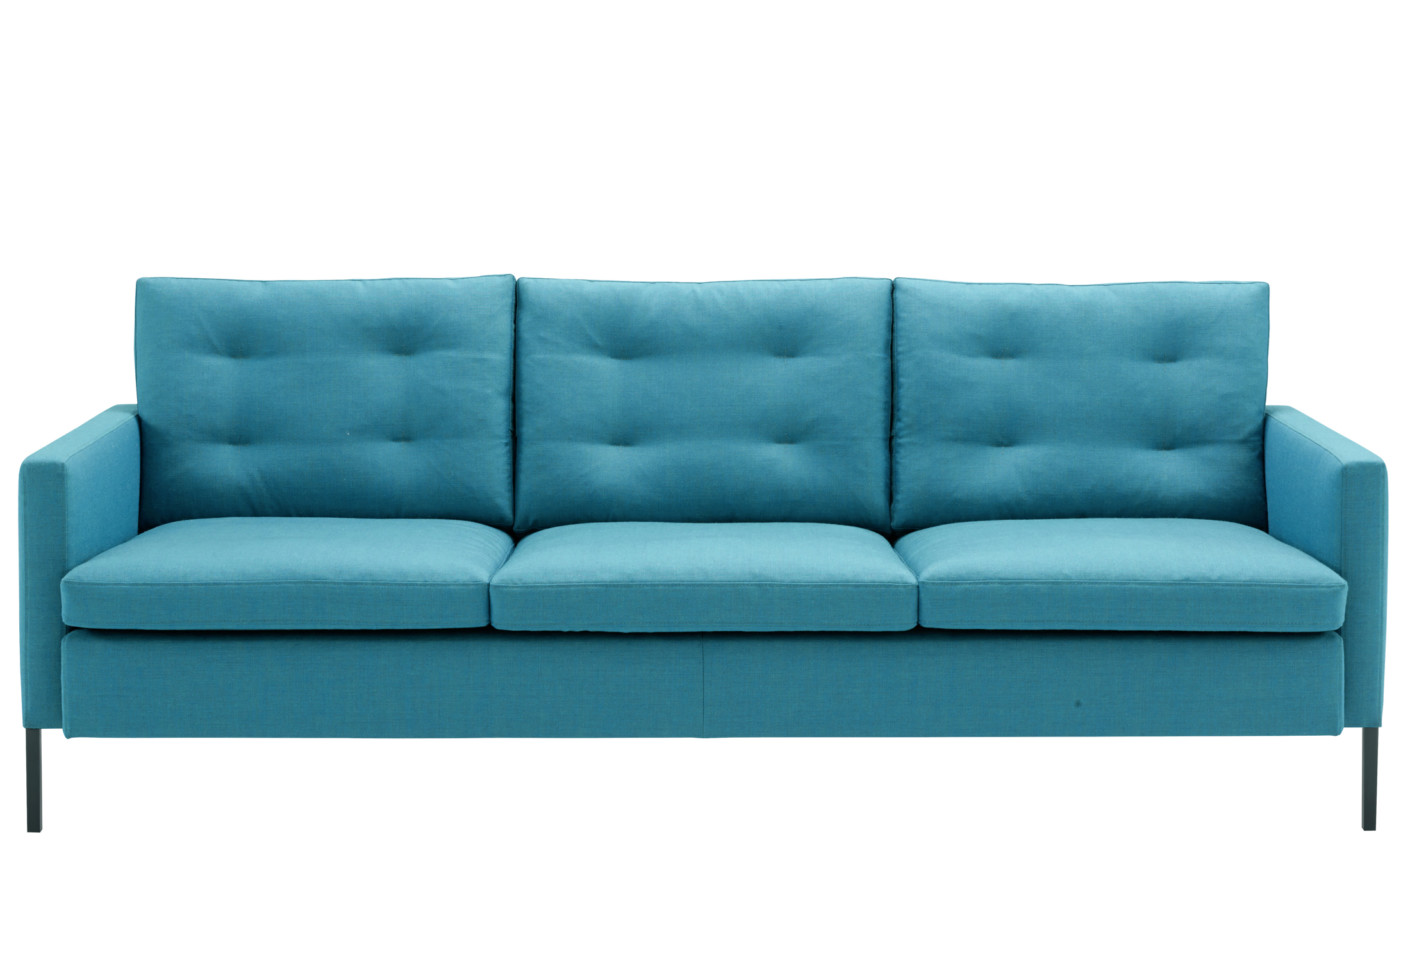 Hudson Sofa 3 Sitzer Von Ligne Roset Stylepark